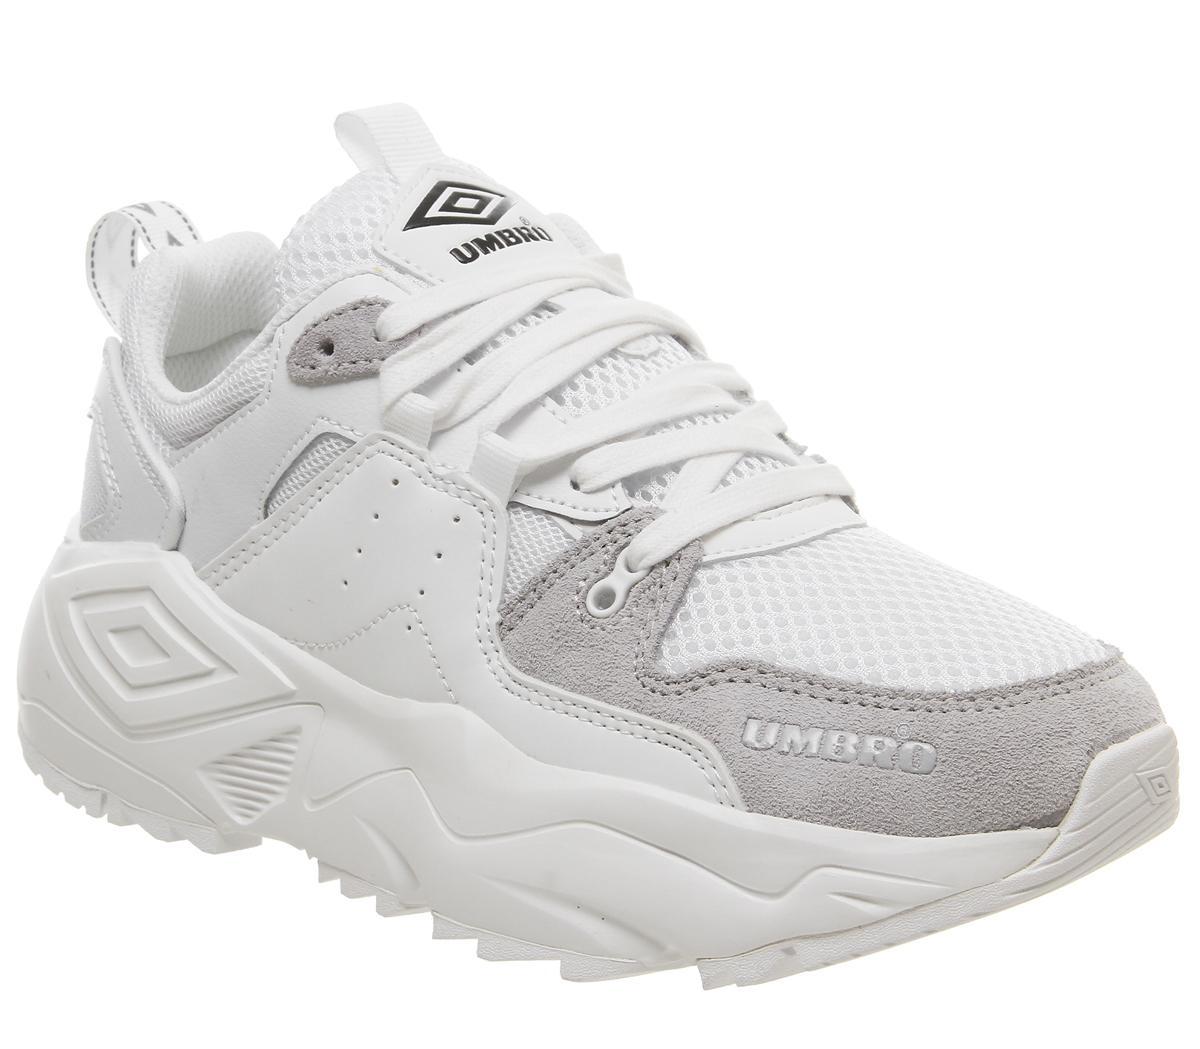 umbro shoes white